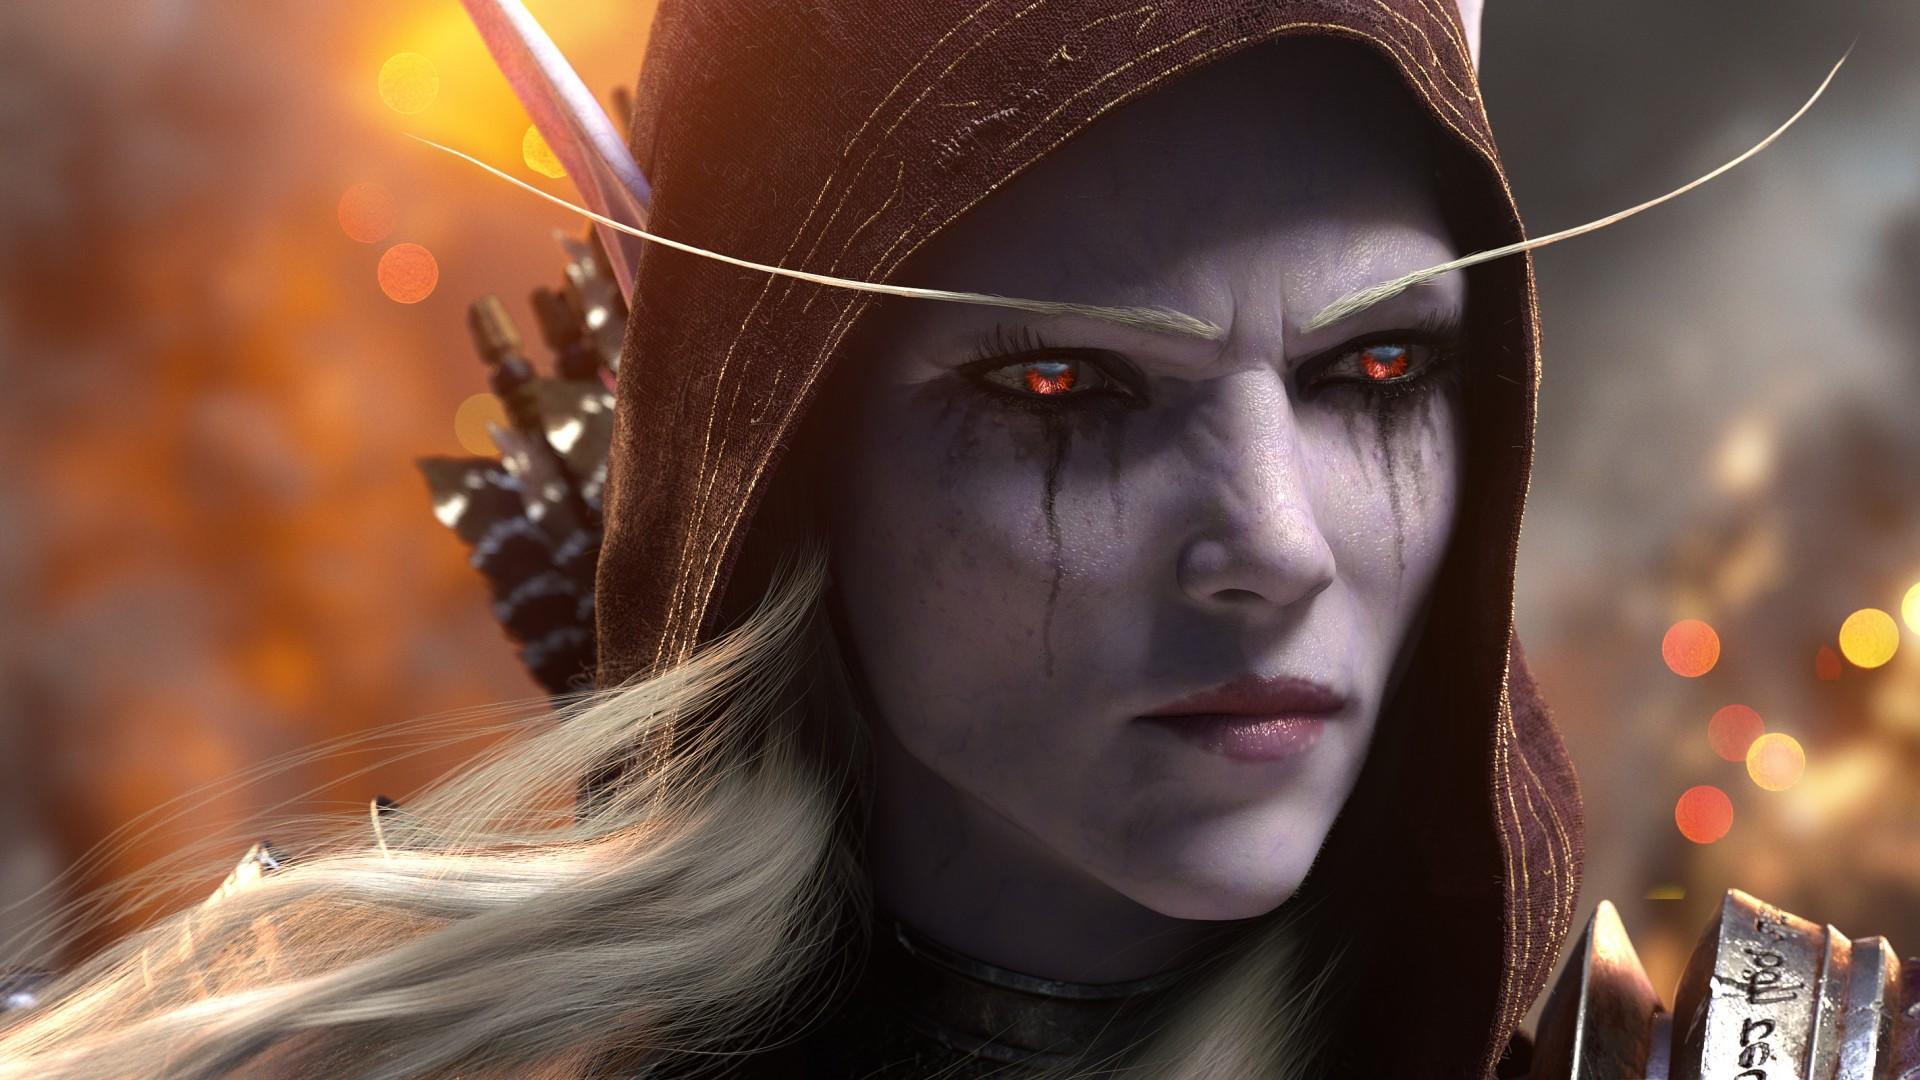 Cute Haunter Wallpaper Sylvanas Windrunner World Of Warcraft Battle For Azeroth